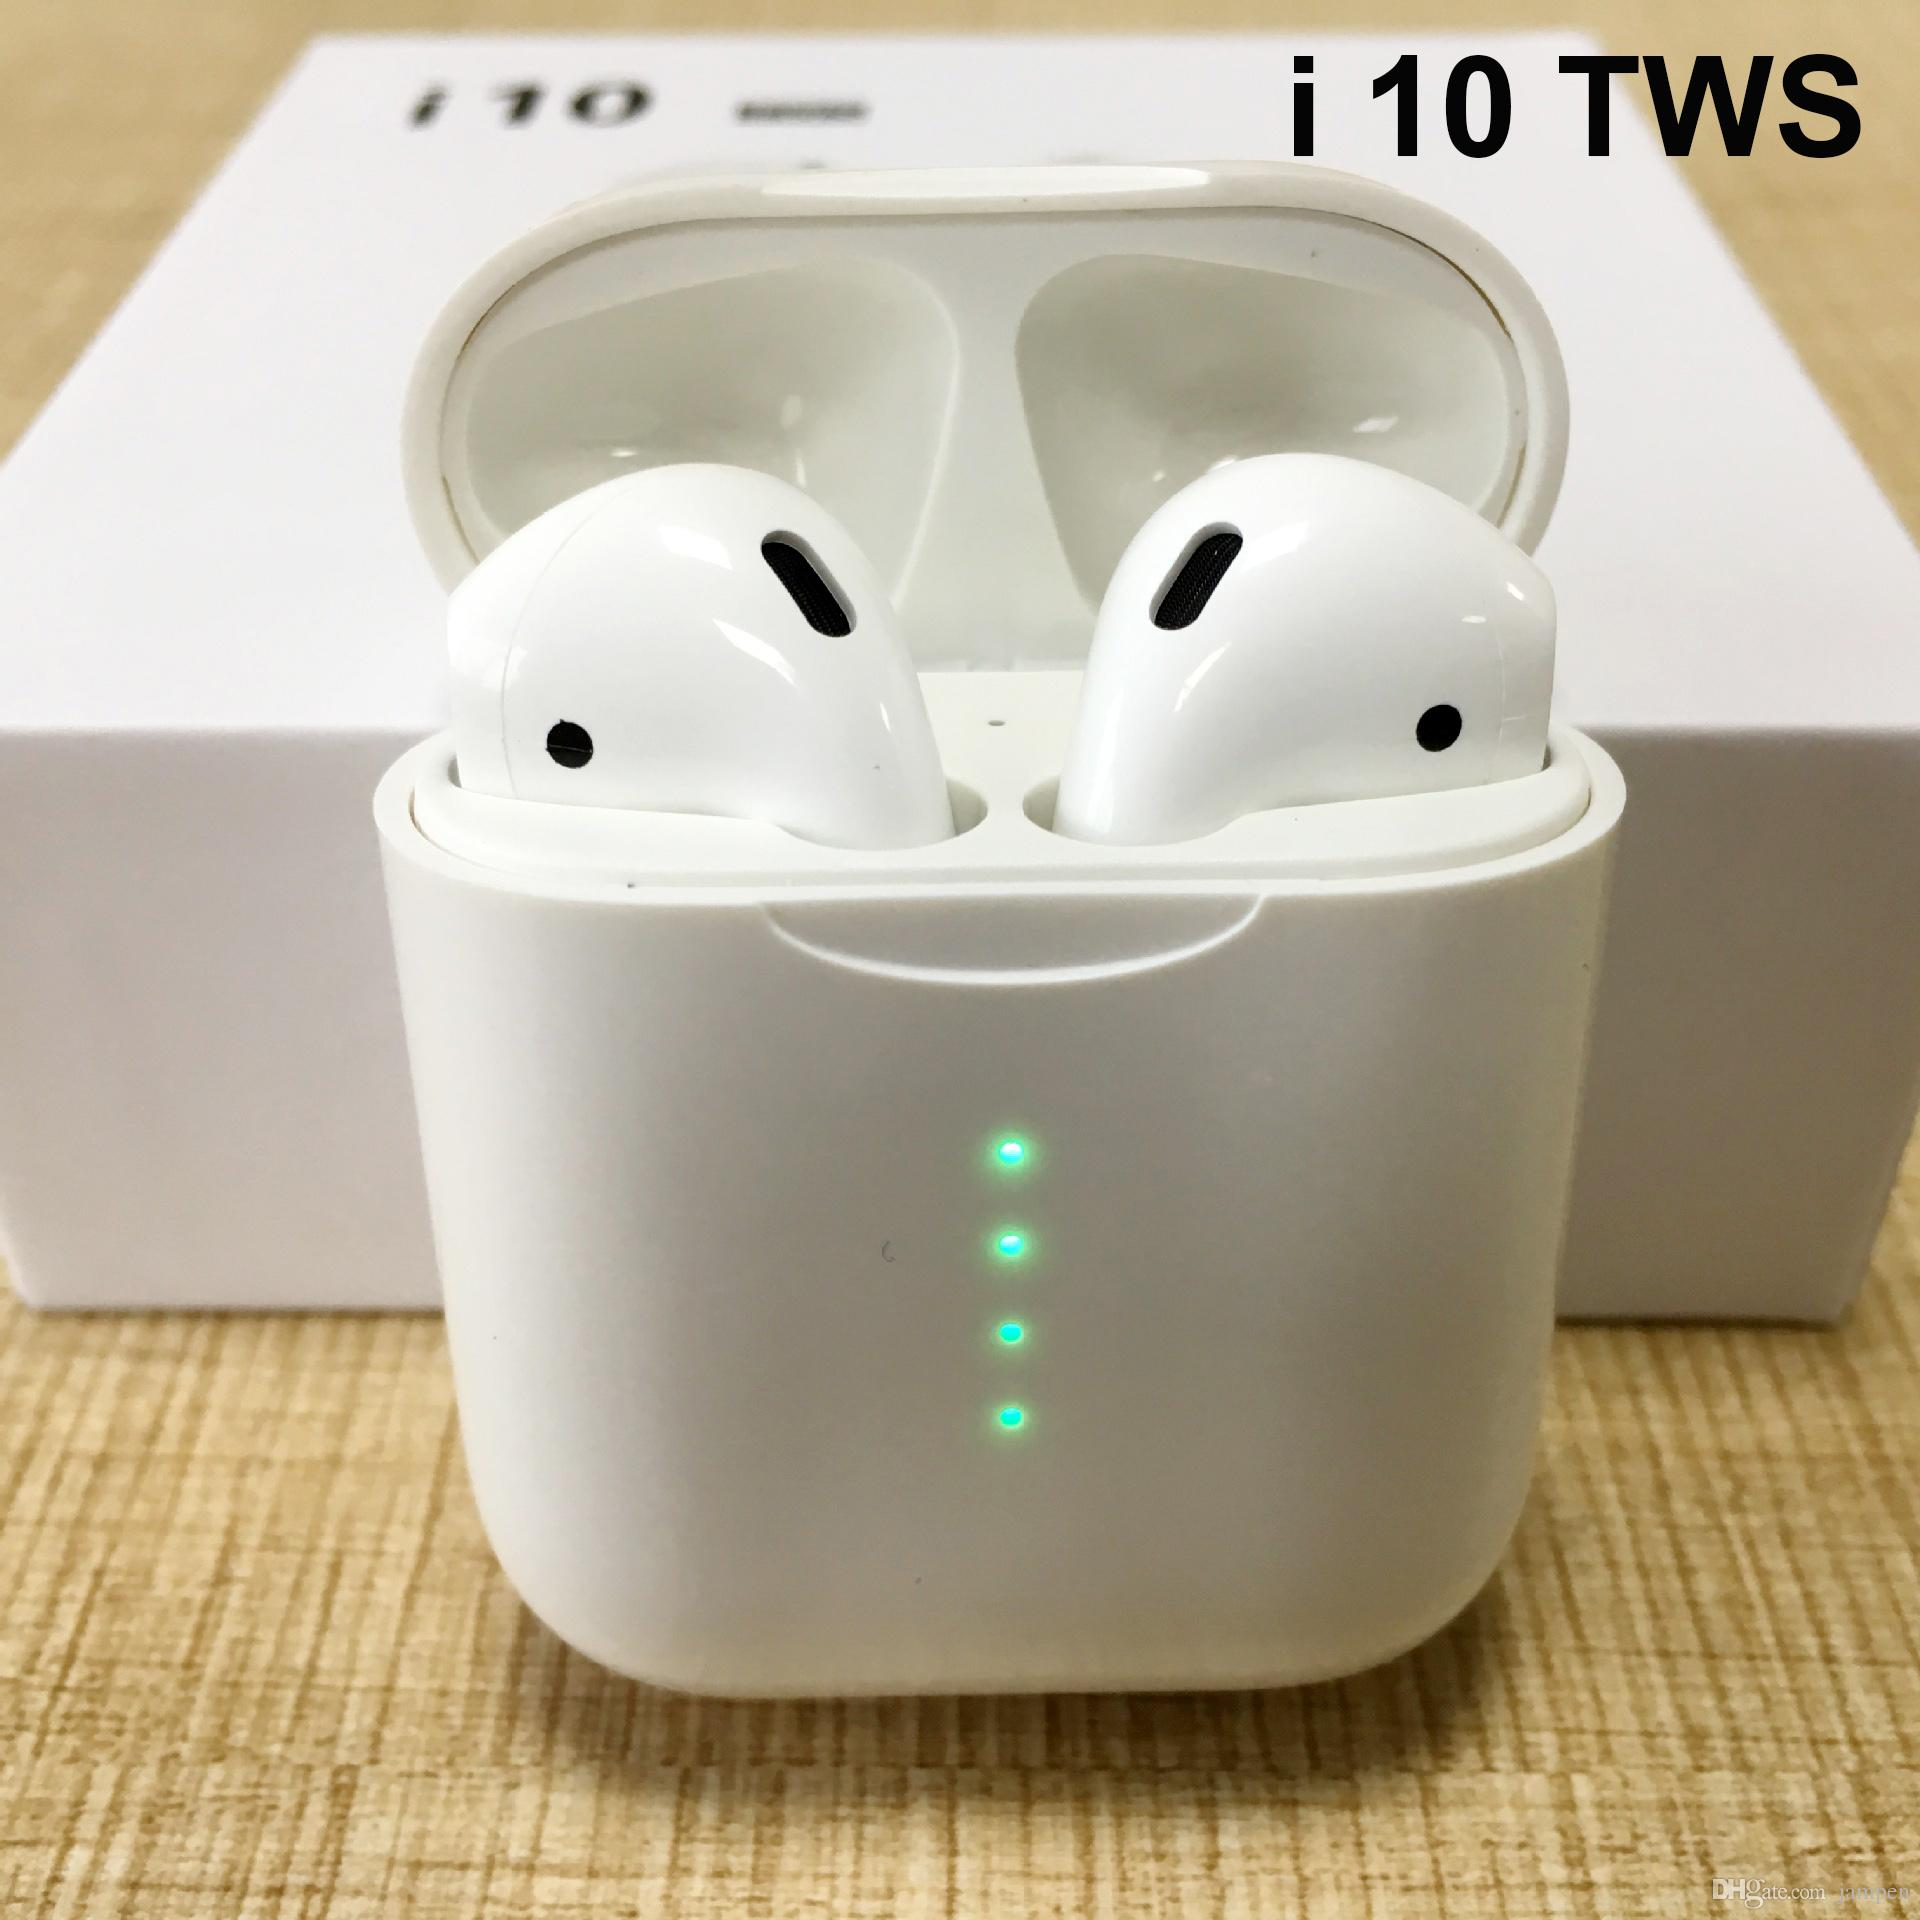 RAVI i10 tws/i9s tws sans fil Bluetooth casques d'écoute tws i10 pour tous les iphone onex/XS MAX air dots i12